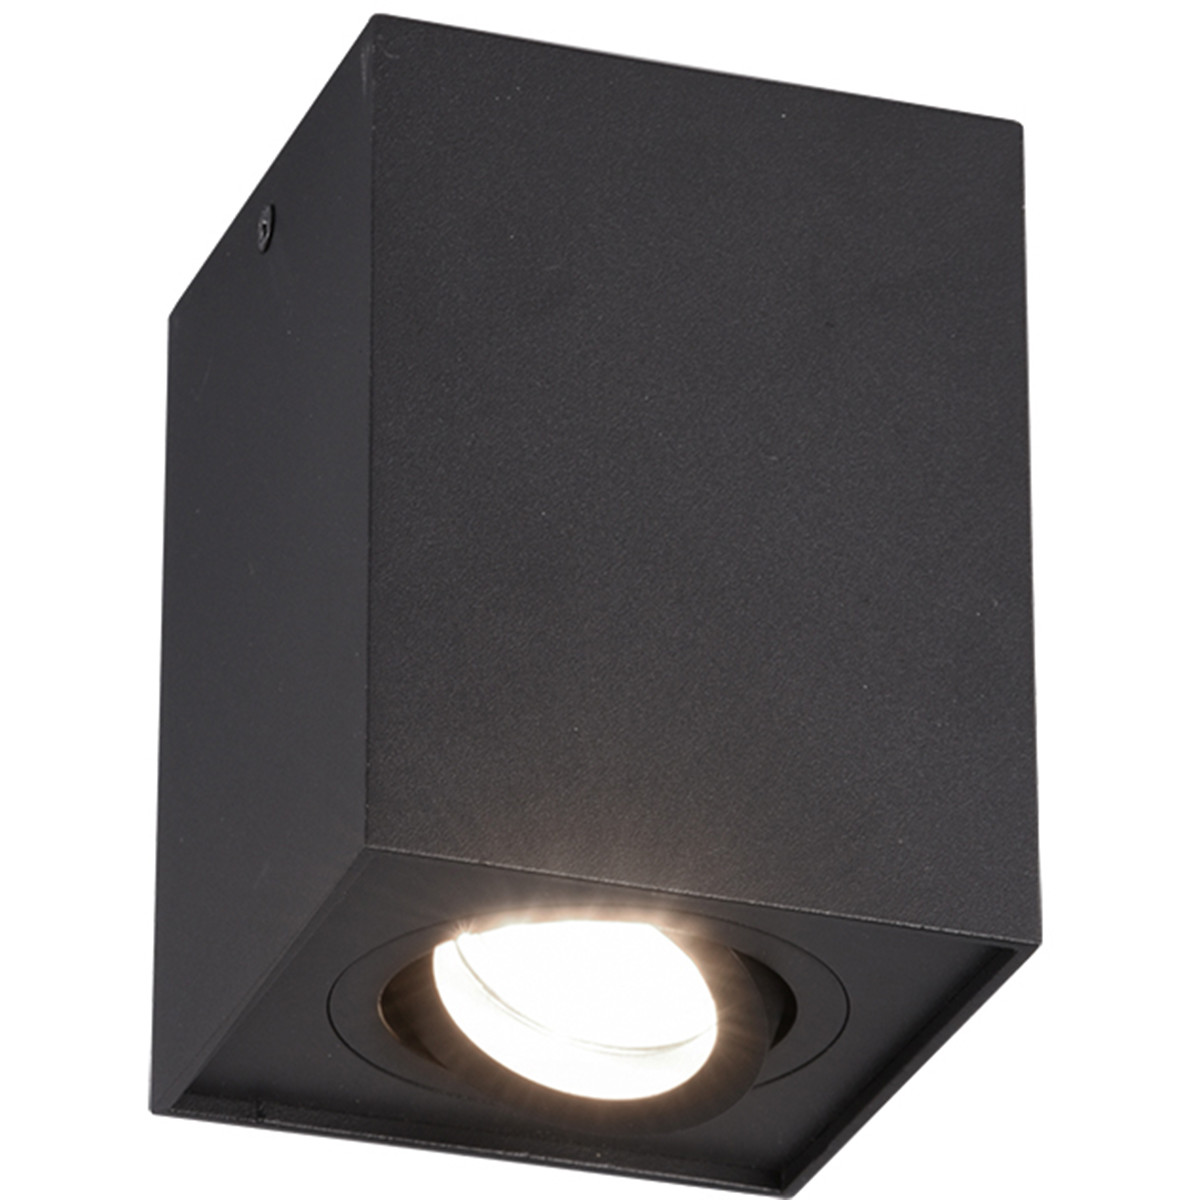 LED Plafondspot - Trion Bisqy - GU10 Fitting - 1-lichts - Vierkant - Mat Zwart - Aluminium